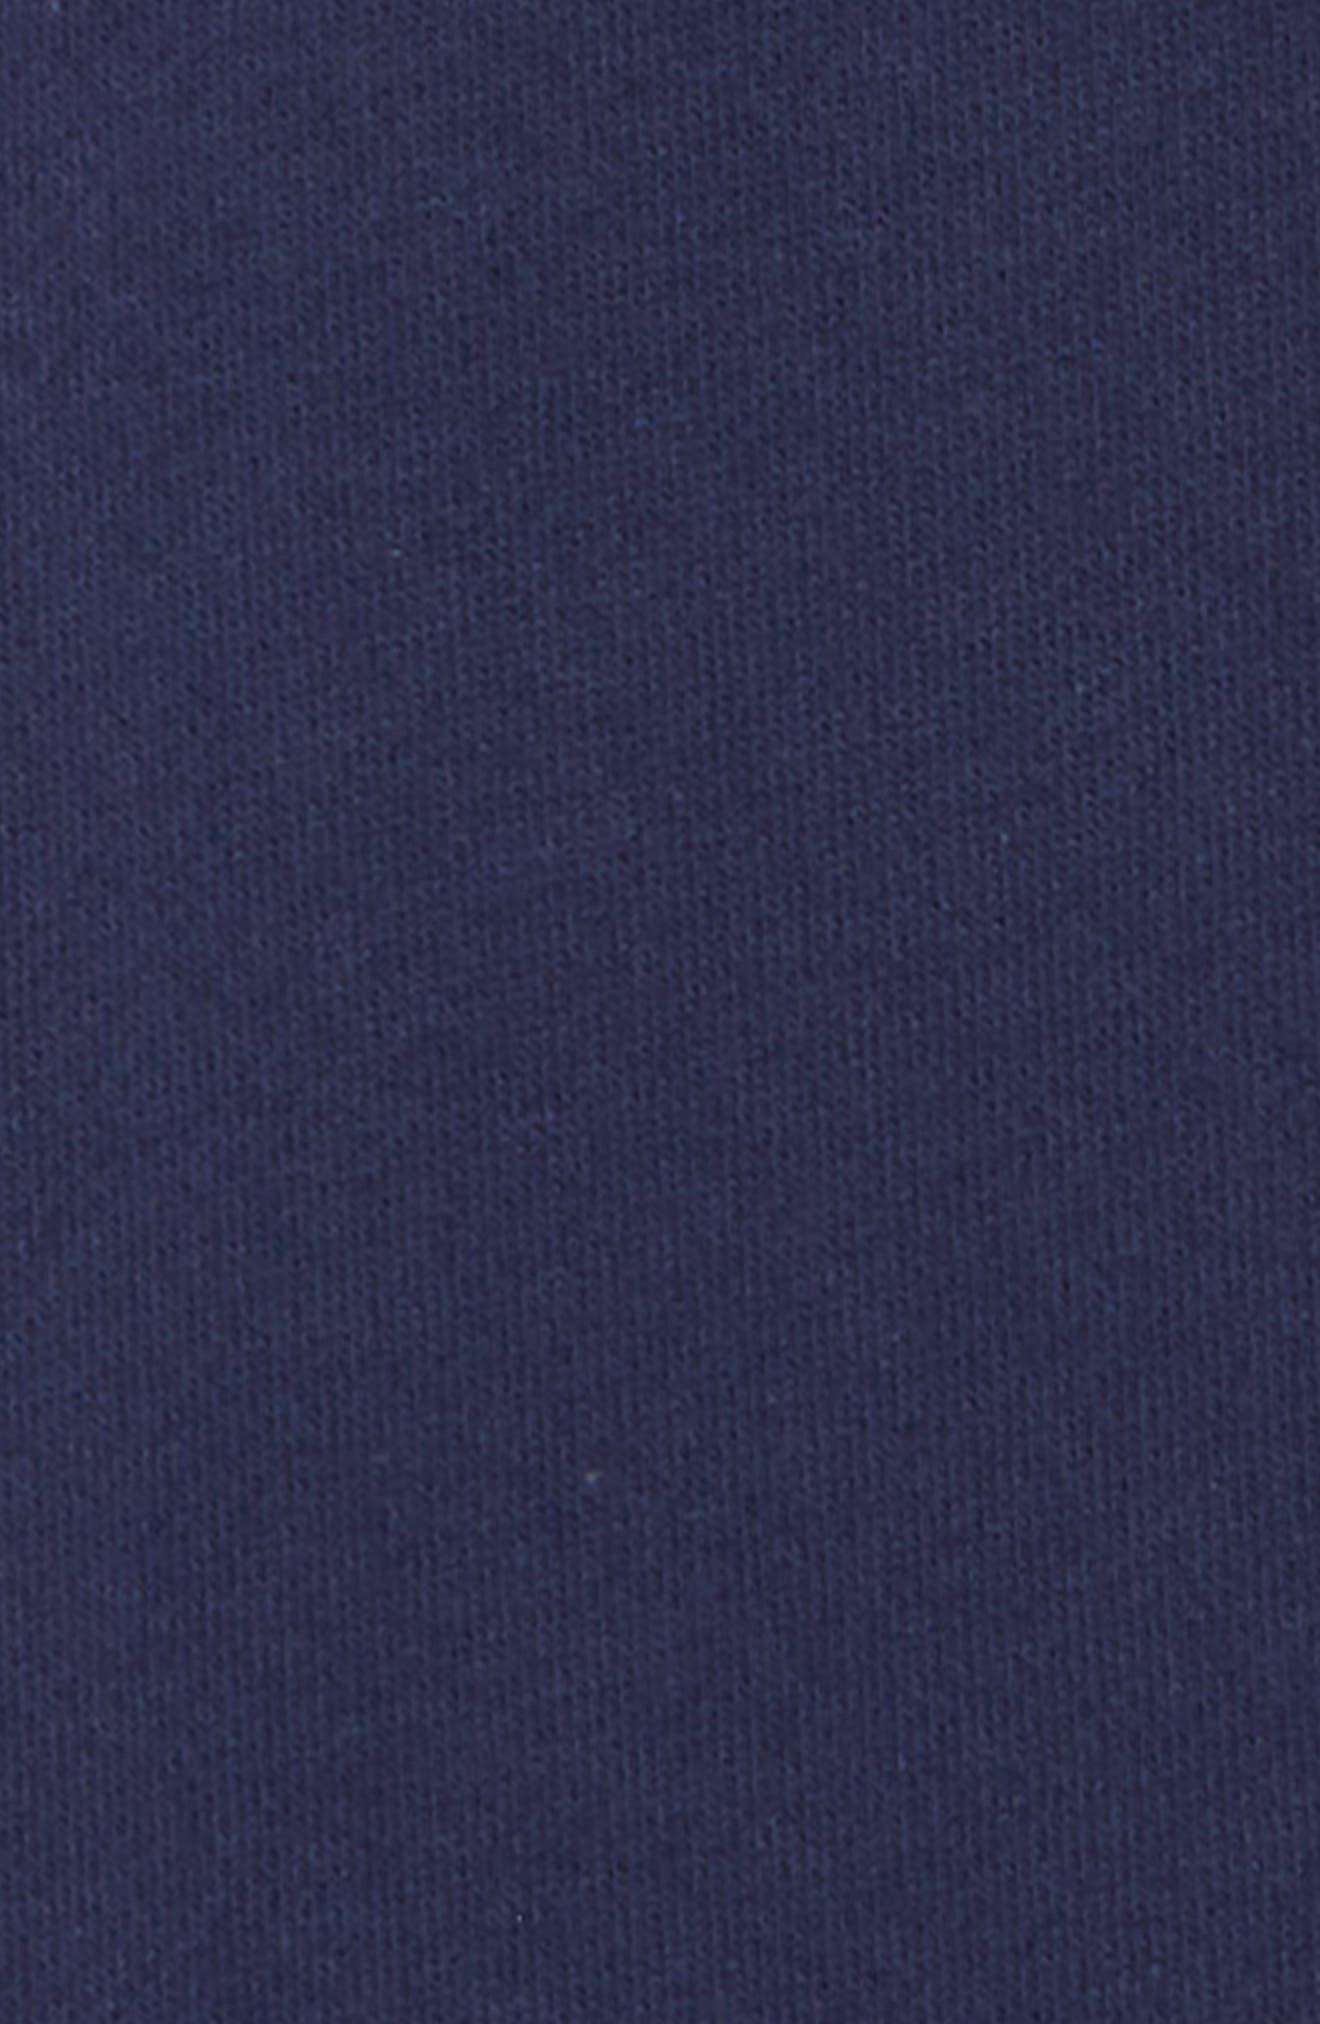 Jersey Jogger Pants,                             Alternate thumbnail 2, color,                             414